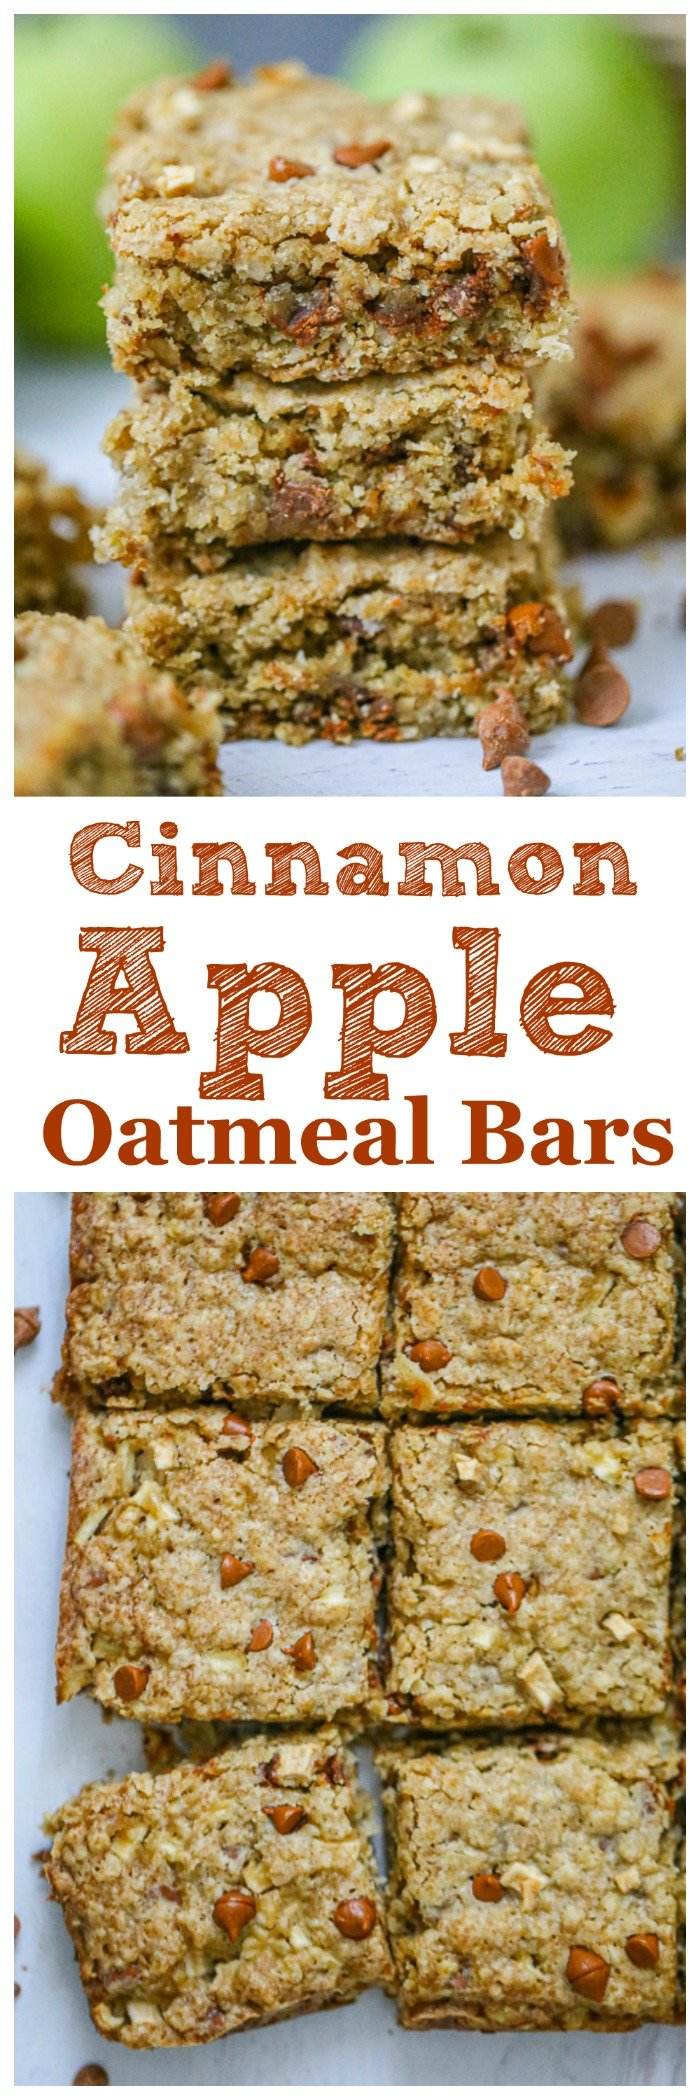 Cinnamon Apple Oatmeal Bars